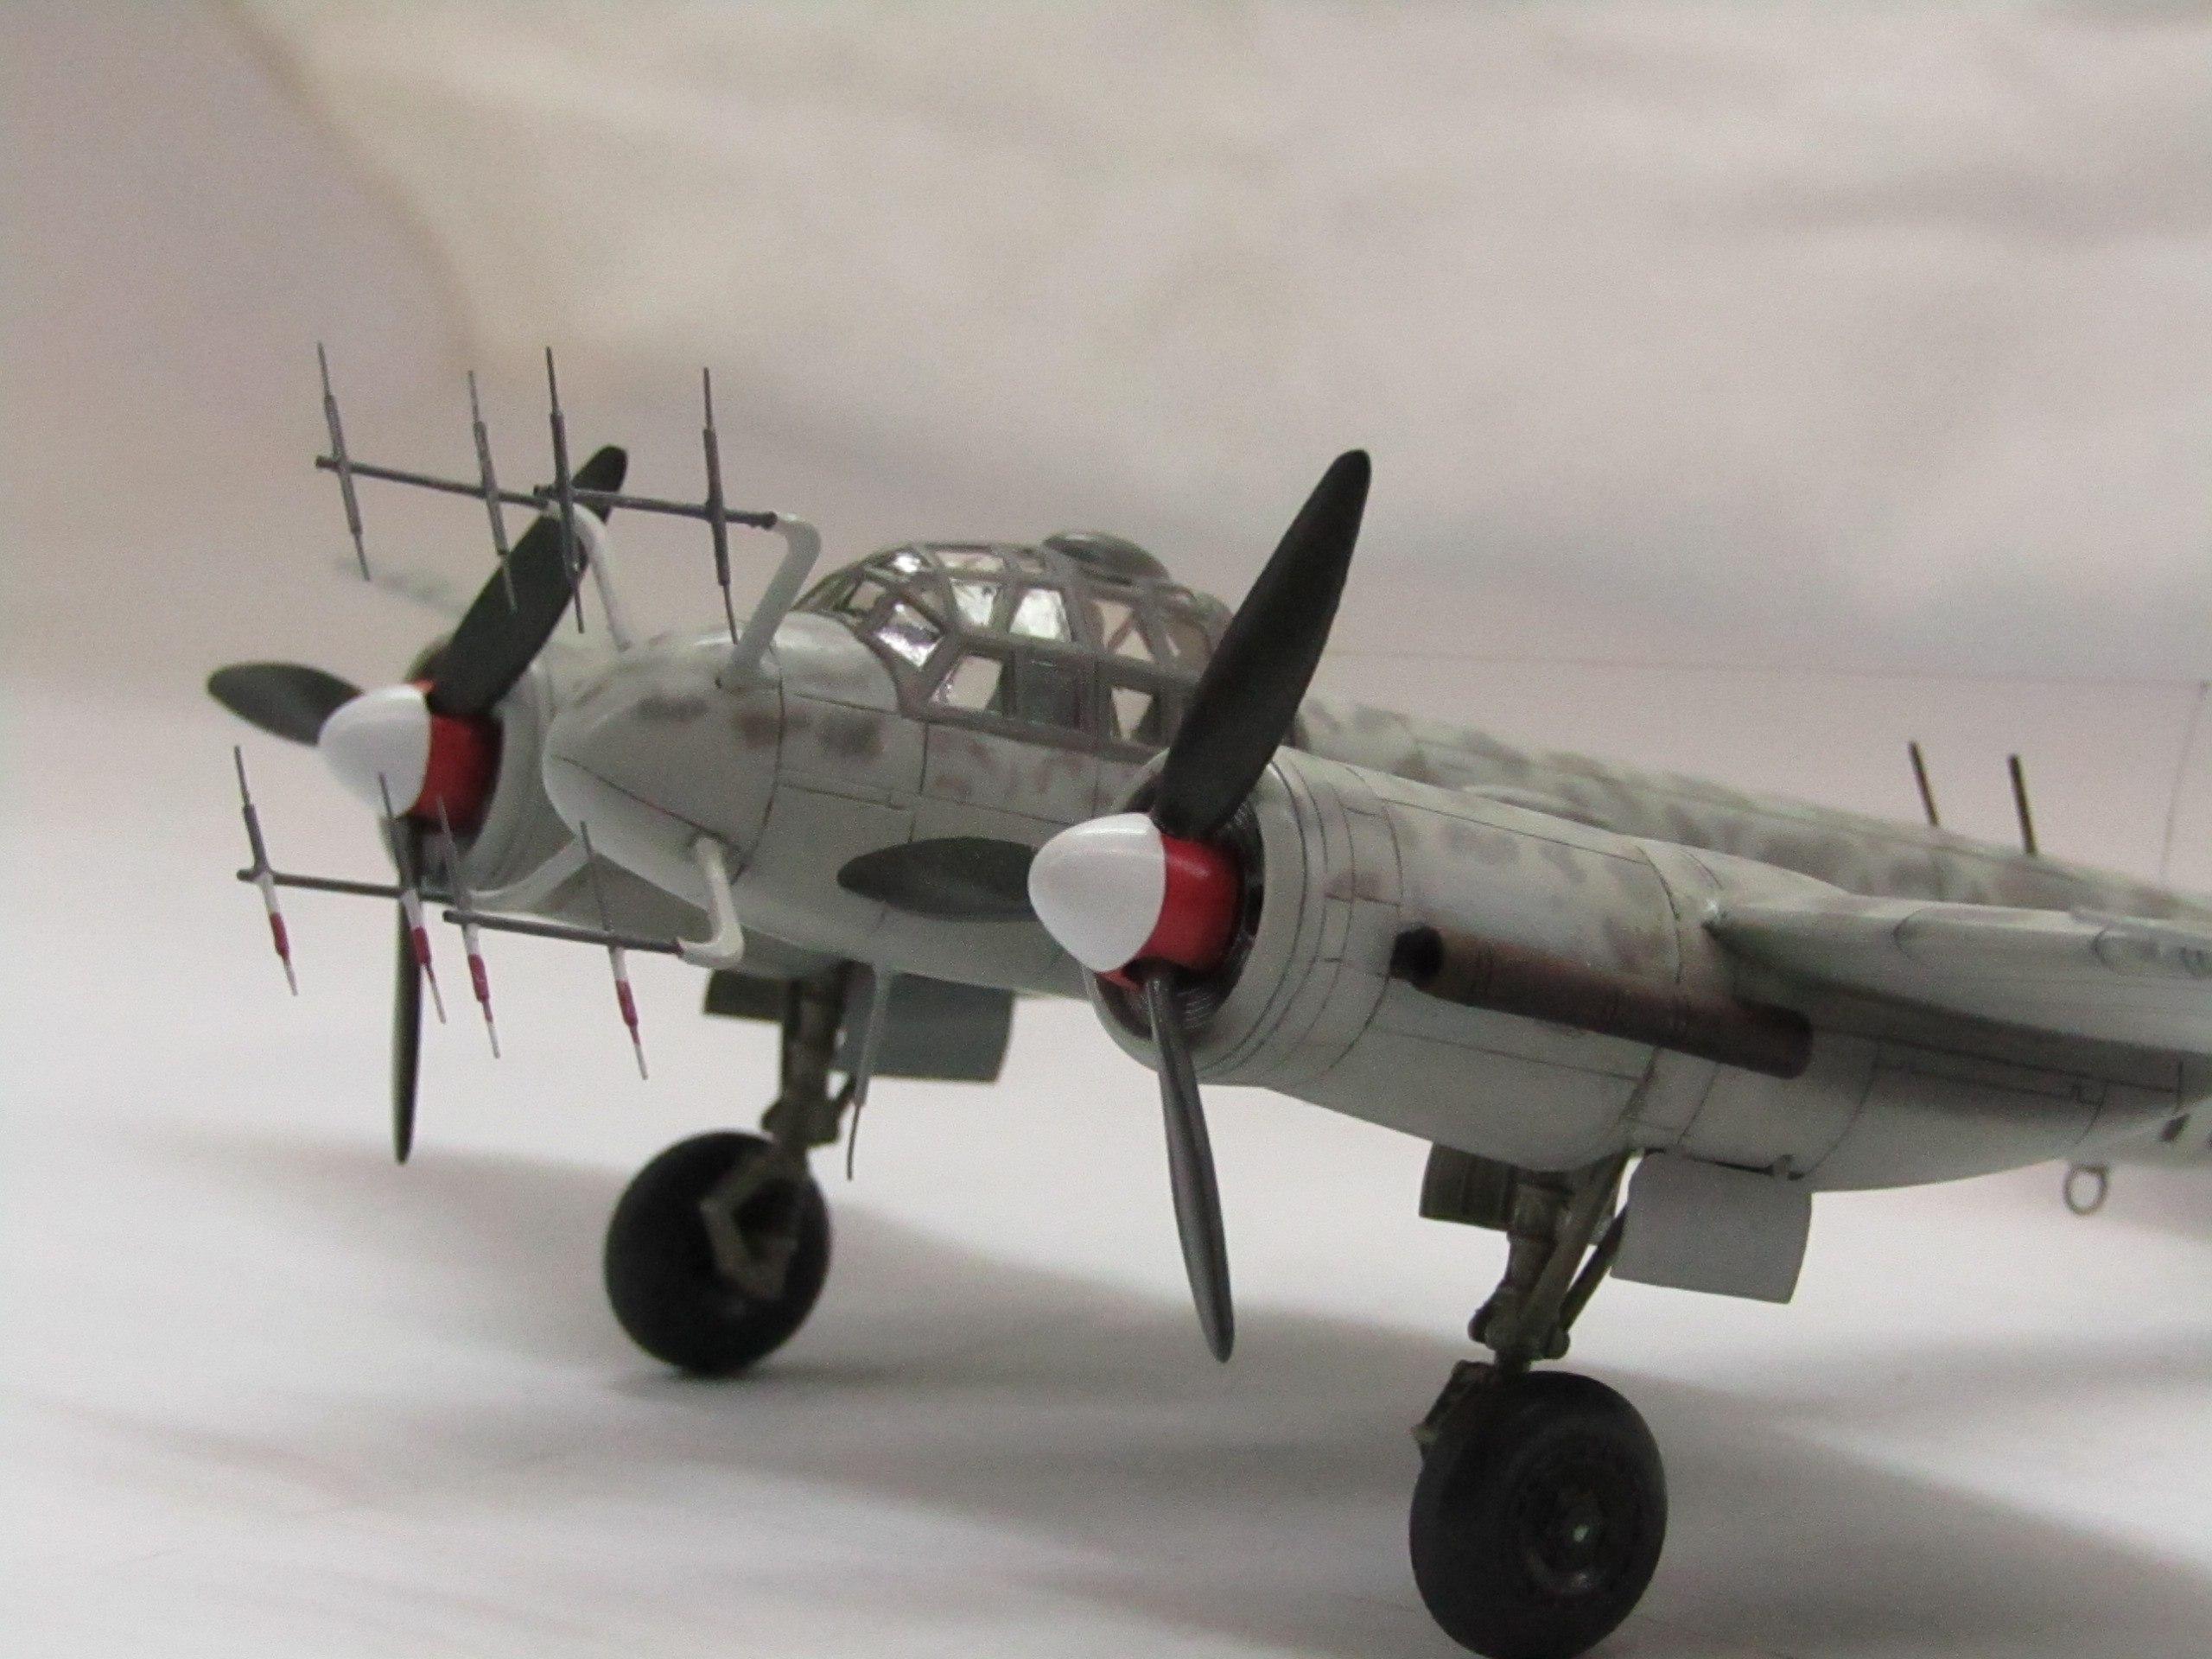 Ju-88 G-6 1/72 (Звезда) ViXRJezn5aw